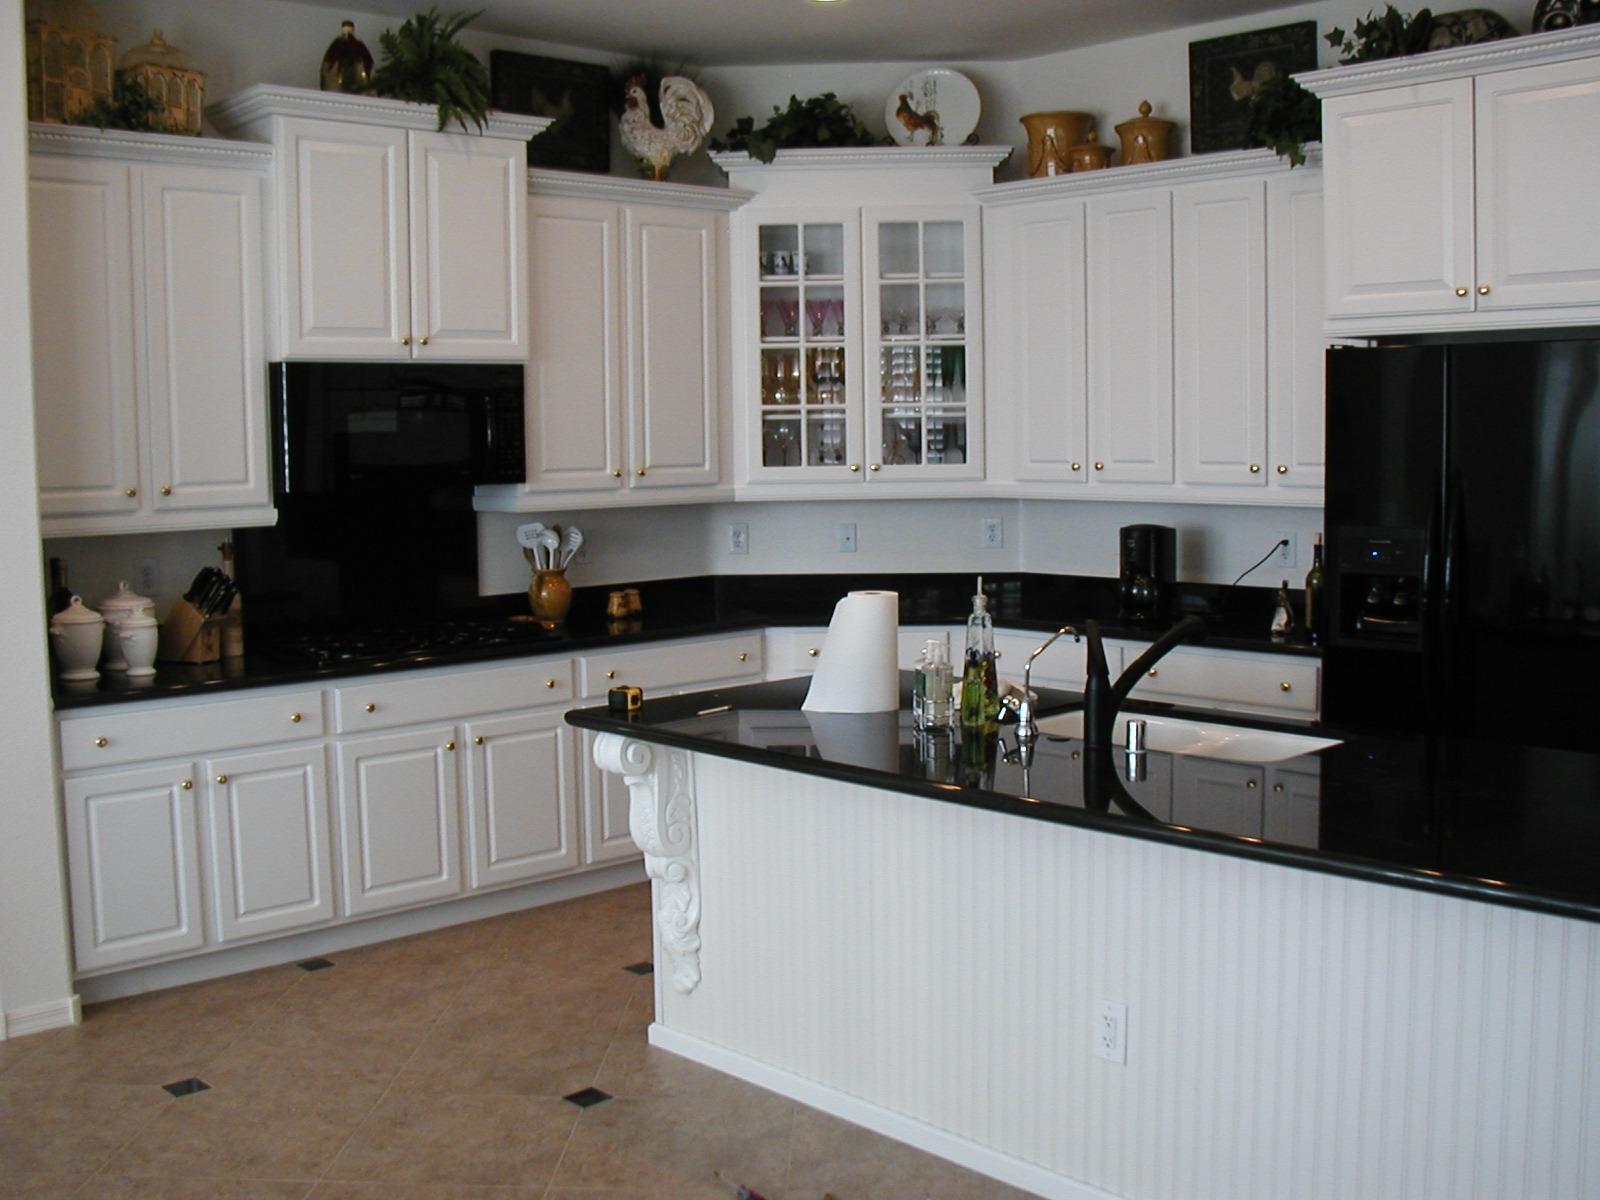 kitchen-white-cabinets-dark-countertops-photo-10